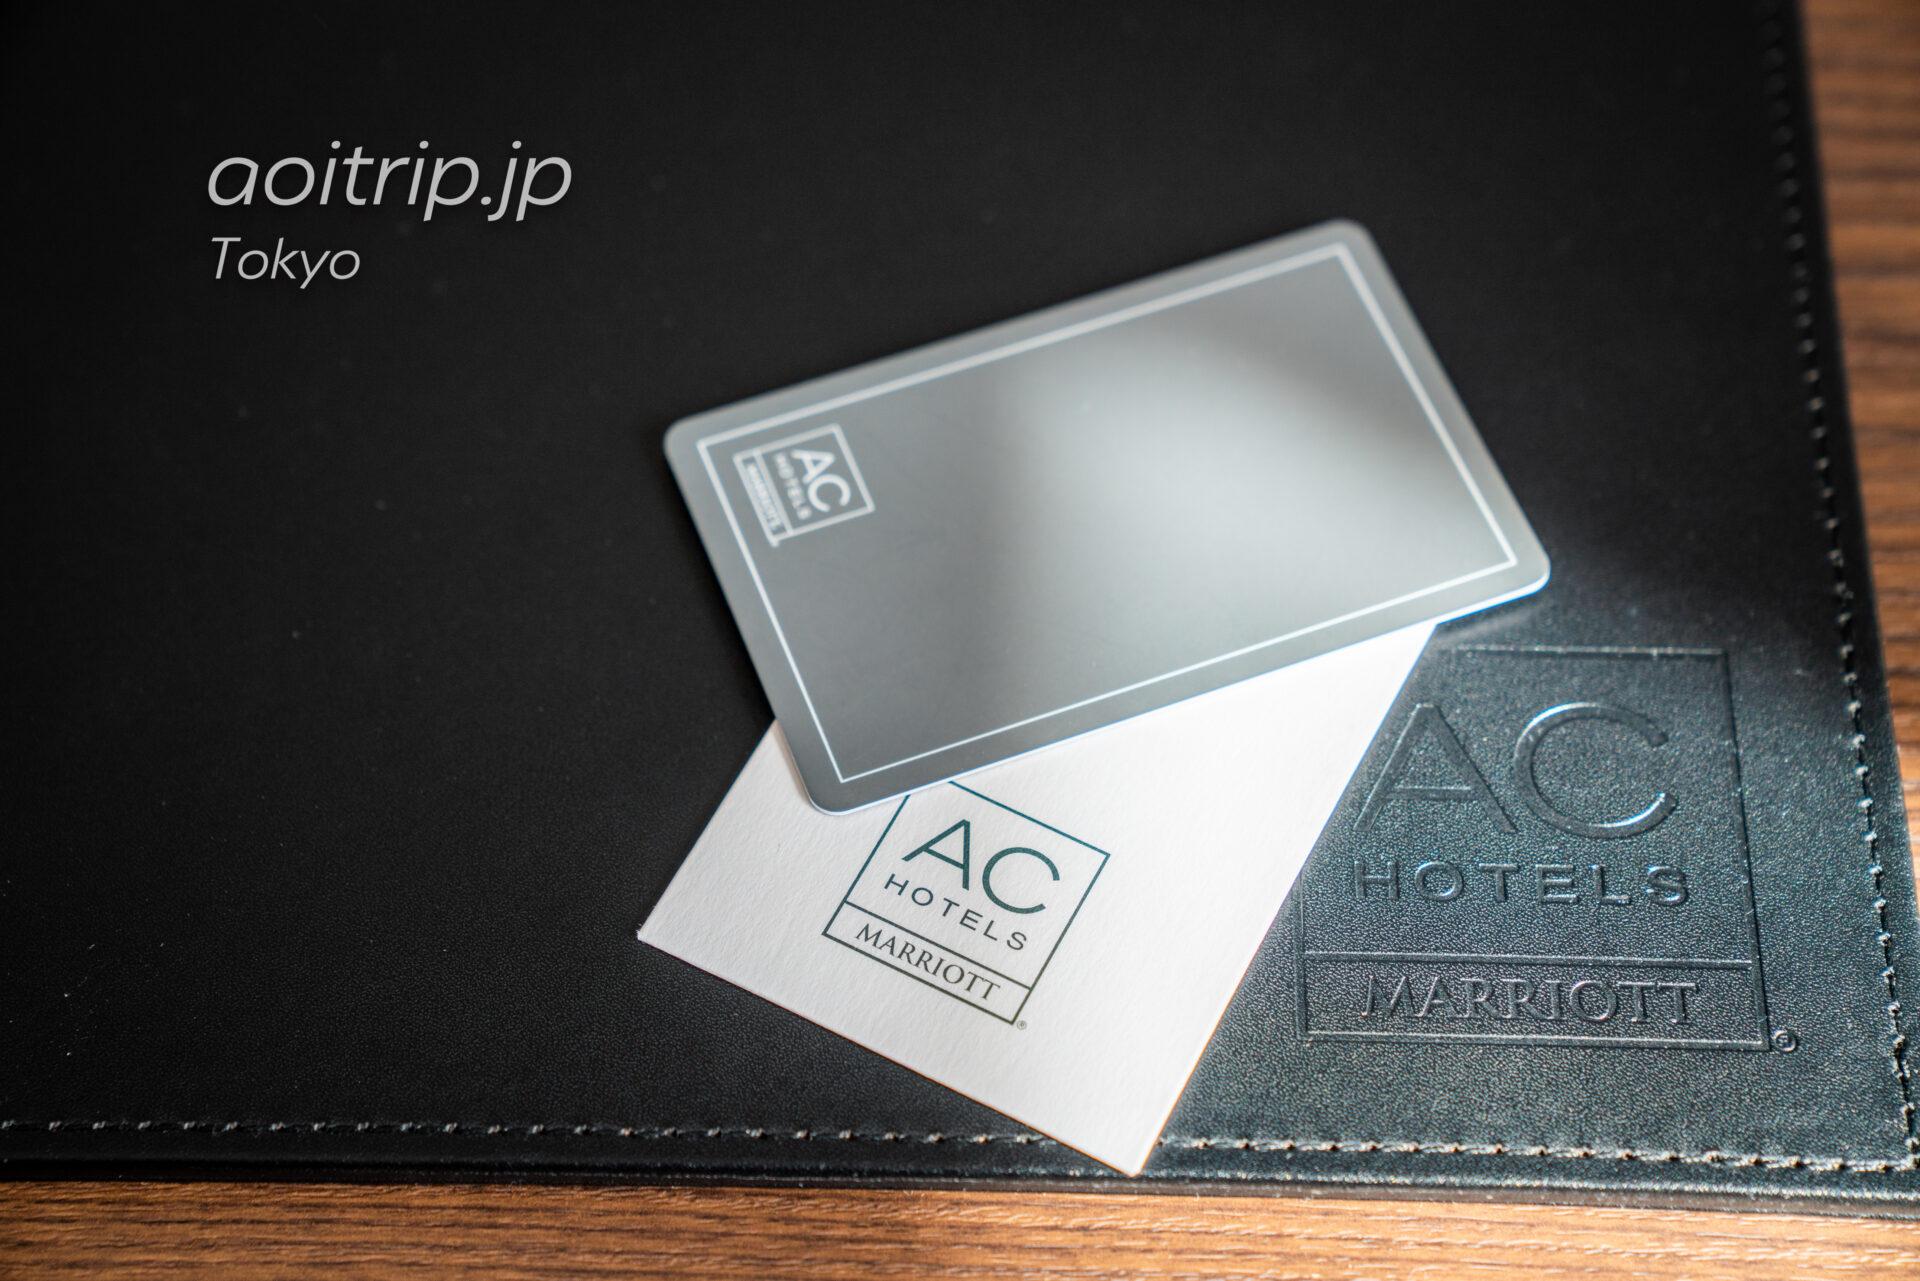 ACホテル東京銀座のカードキー